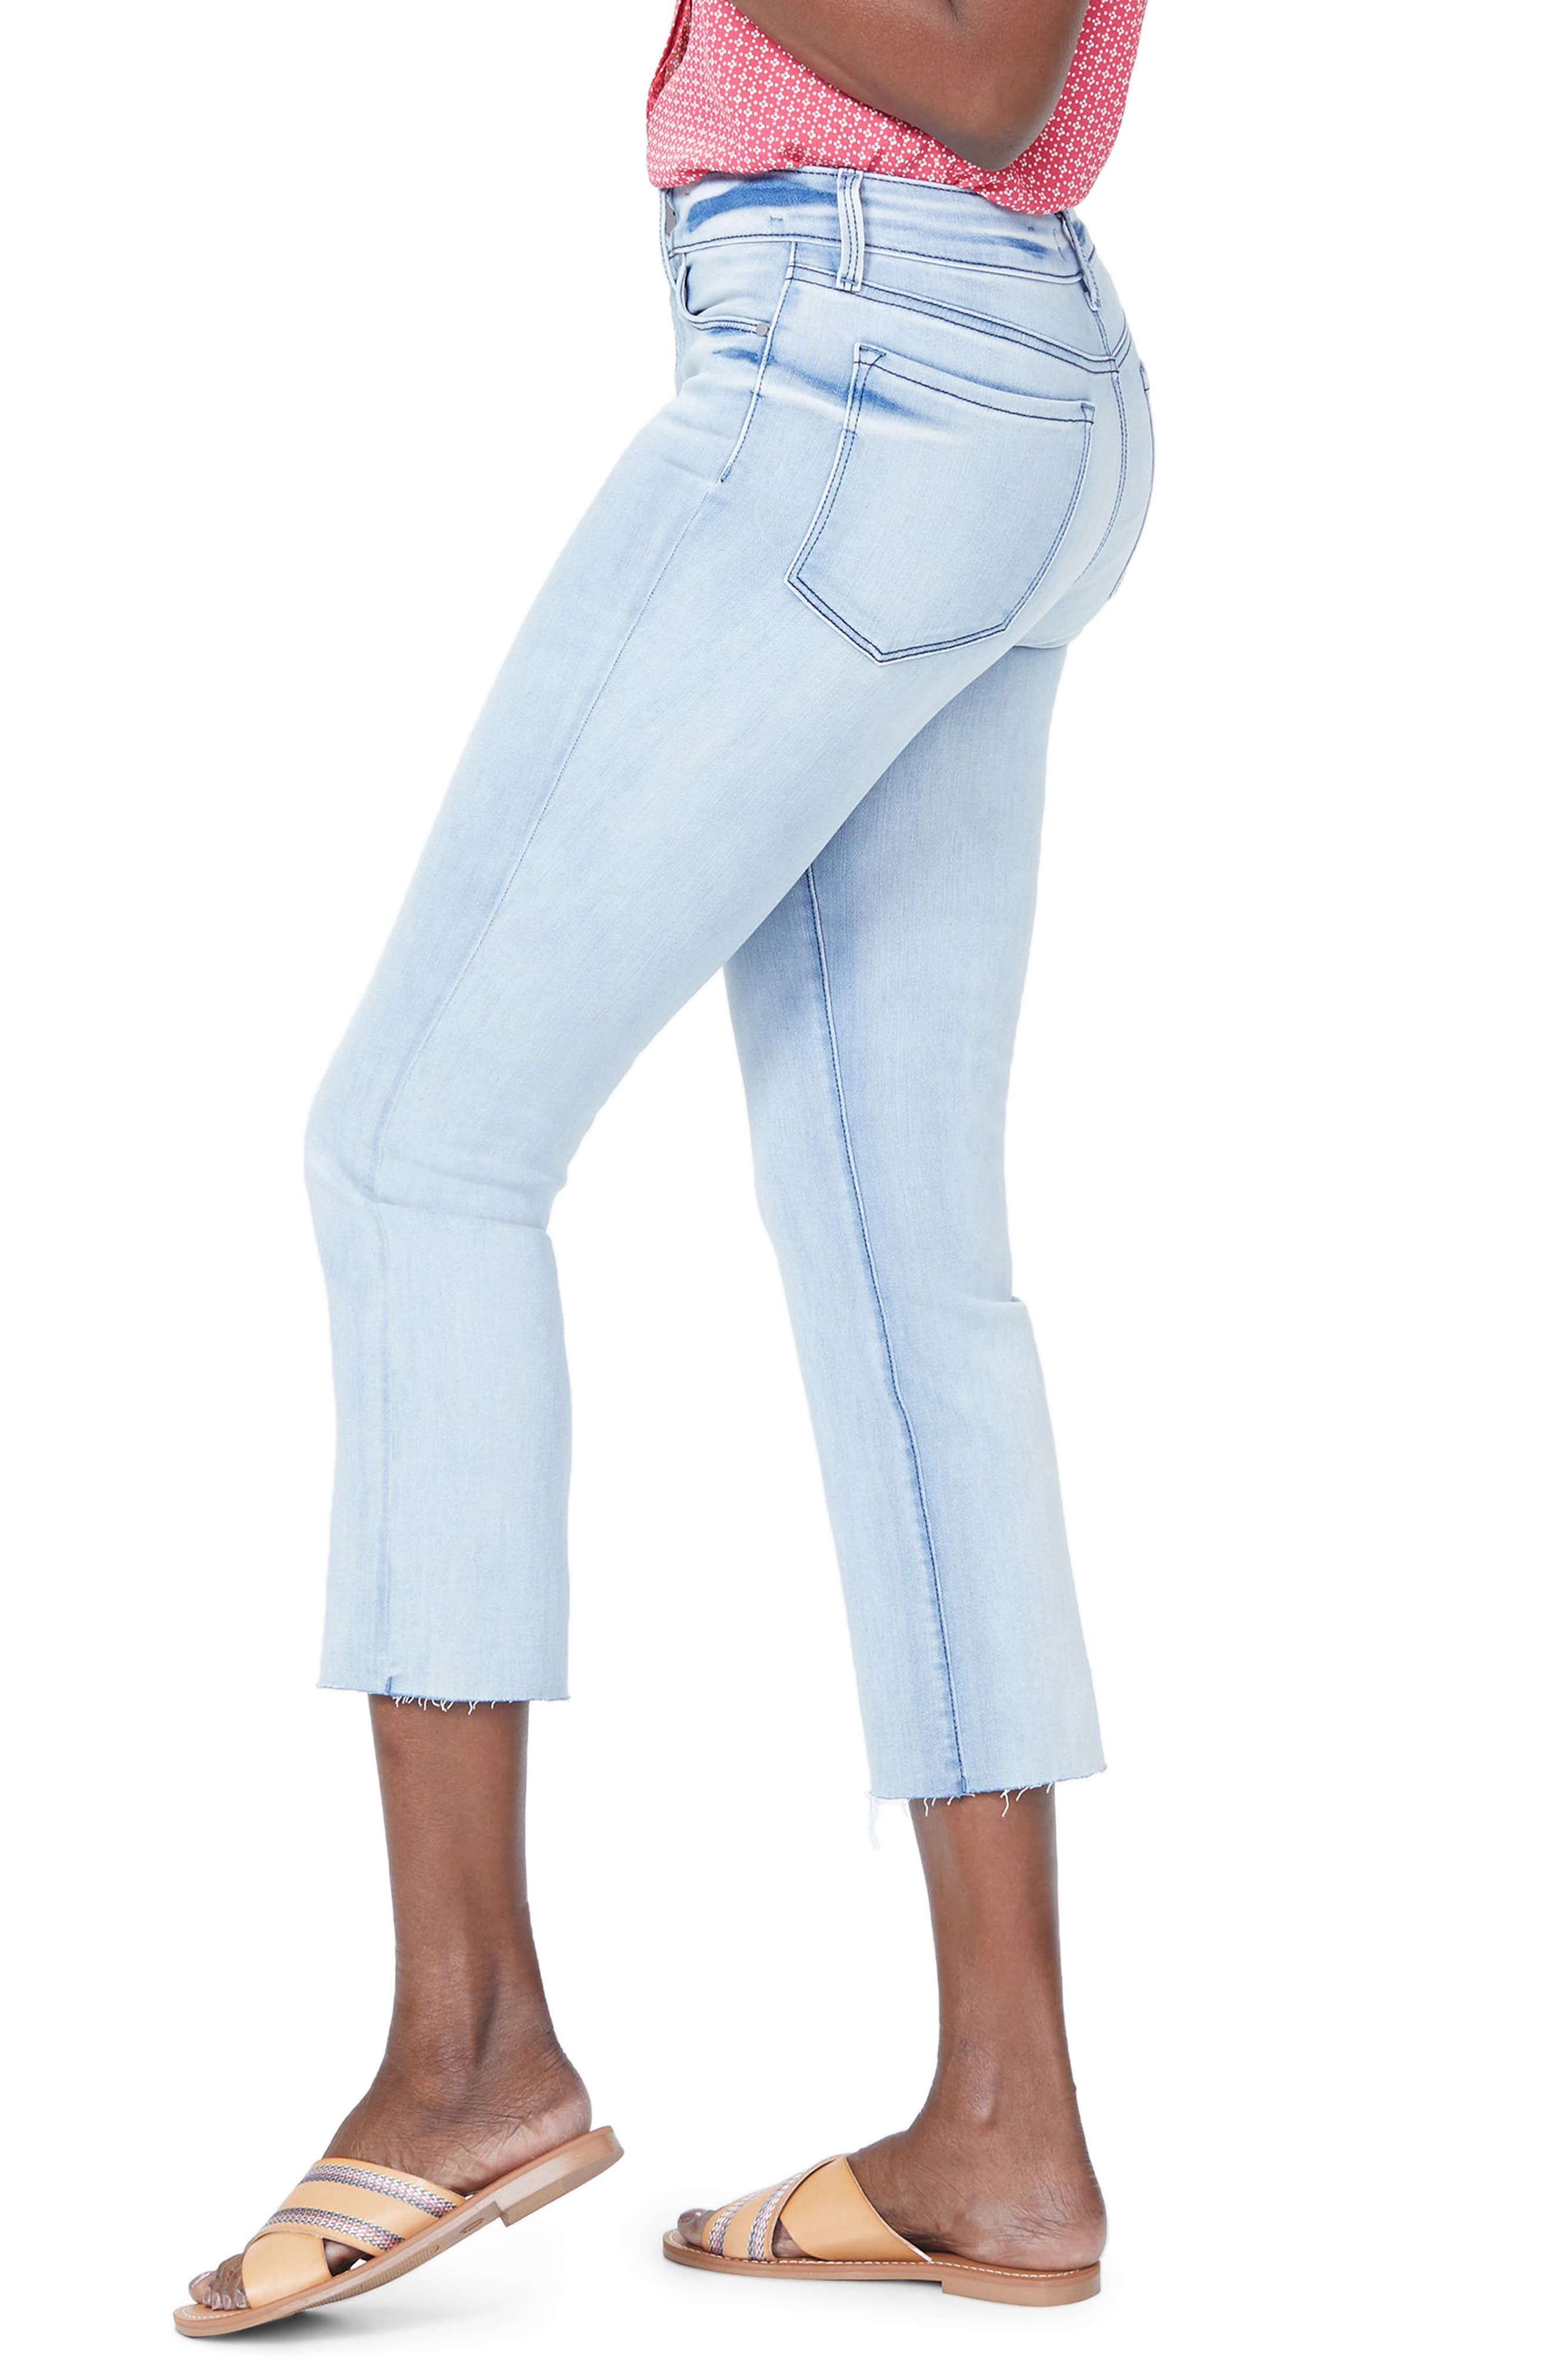 Marilyn Ankle Skinny Jeans,                             Alternate thumbnail 3, color,                             Stillwater